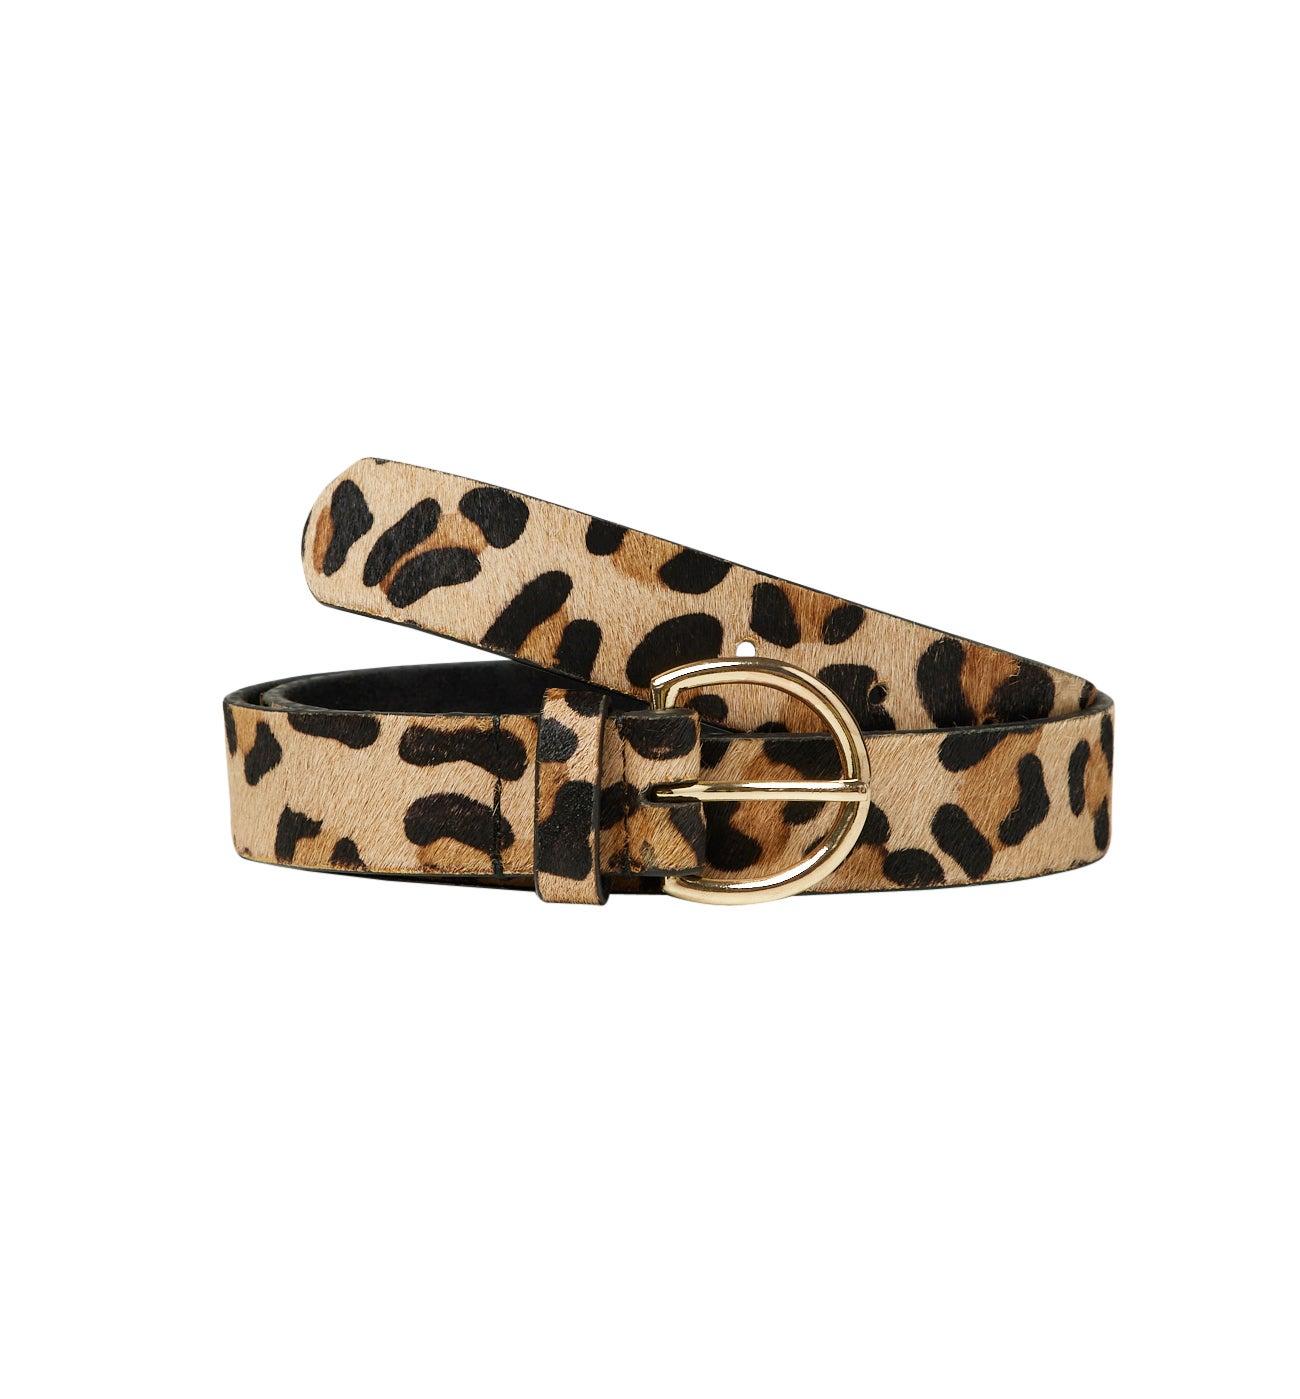 Ceinture en cuir effet léopard